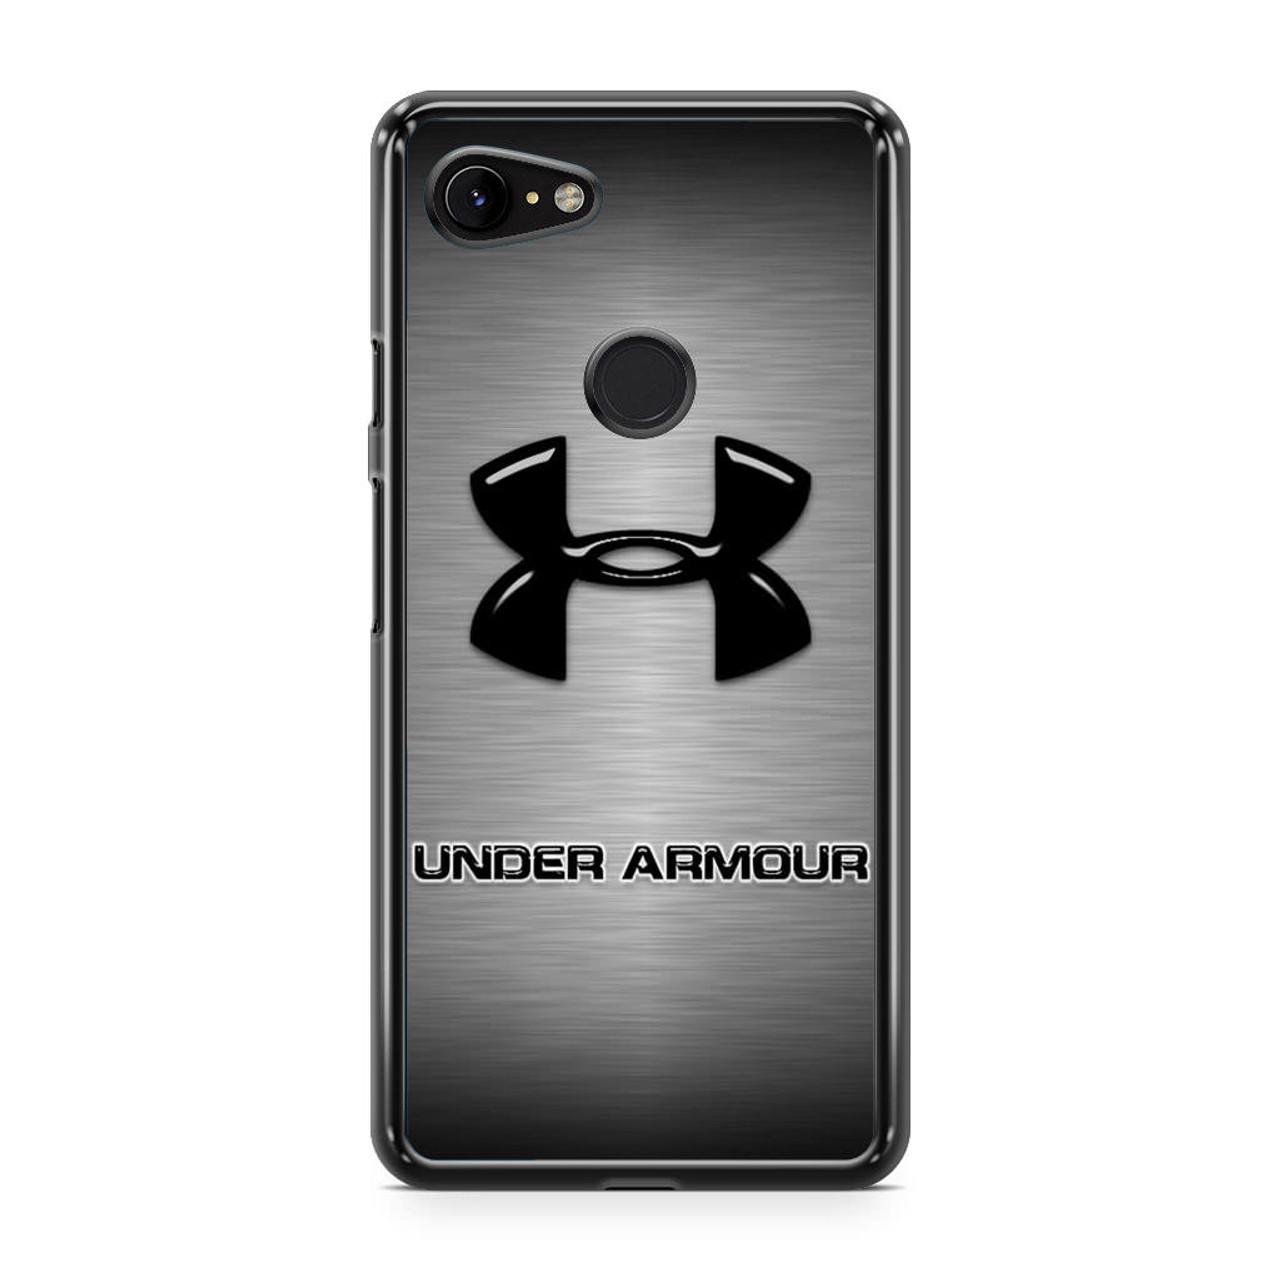 promo code 3b962 8e677 Under Armour Google Pixel 3 XL Case